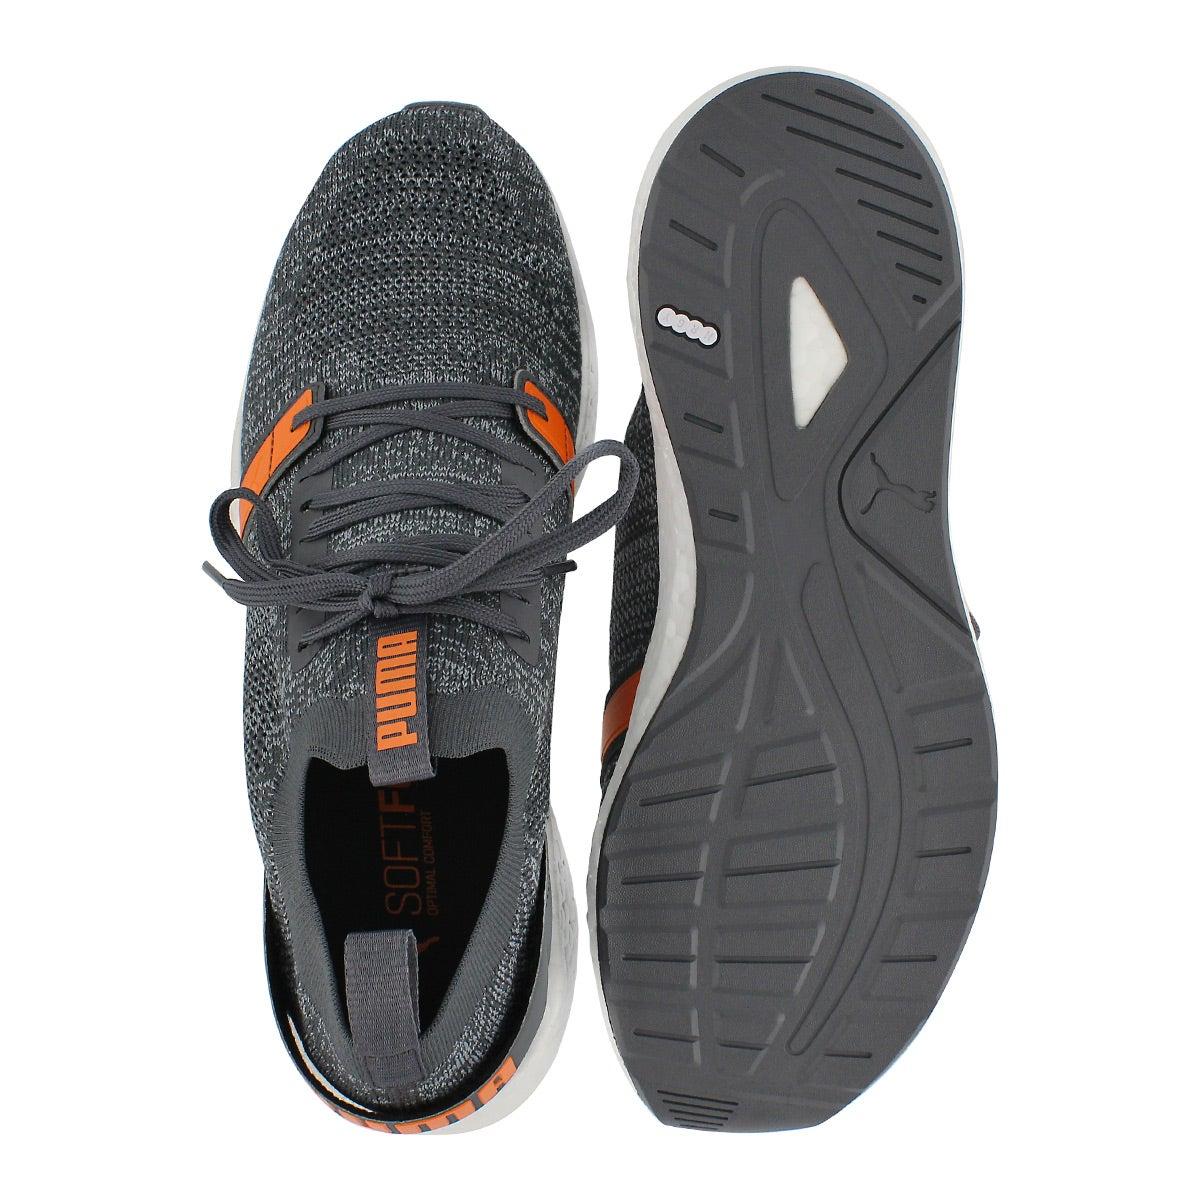 Mns NRGY Neko iron/fire slip on sneaker